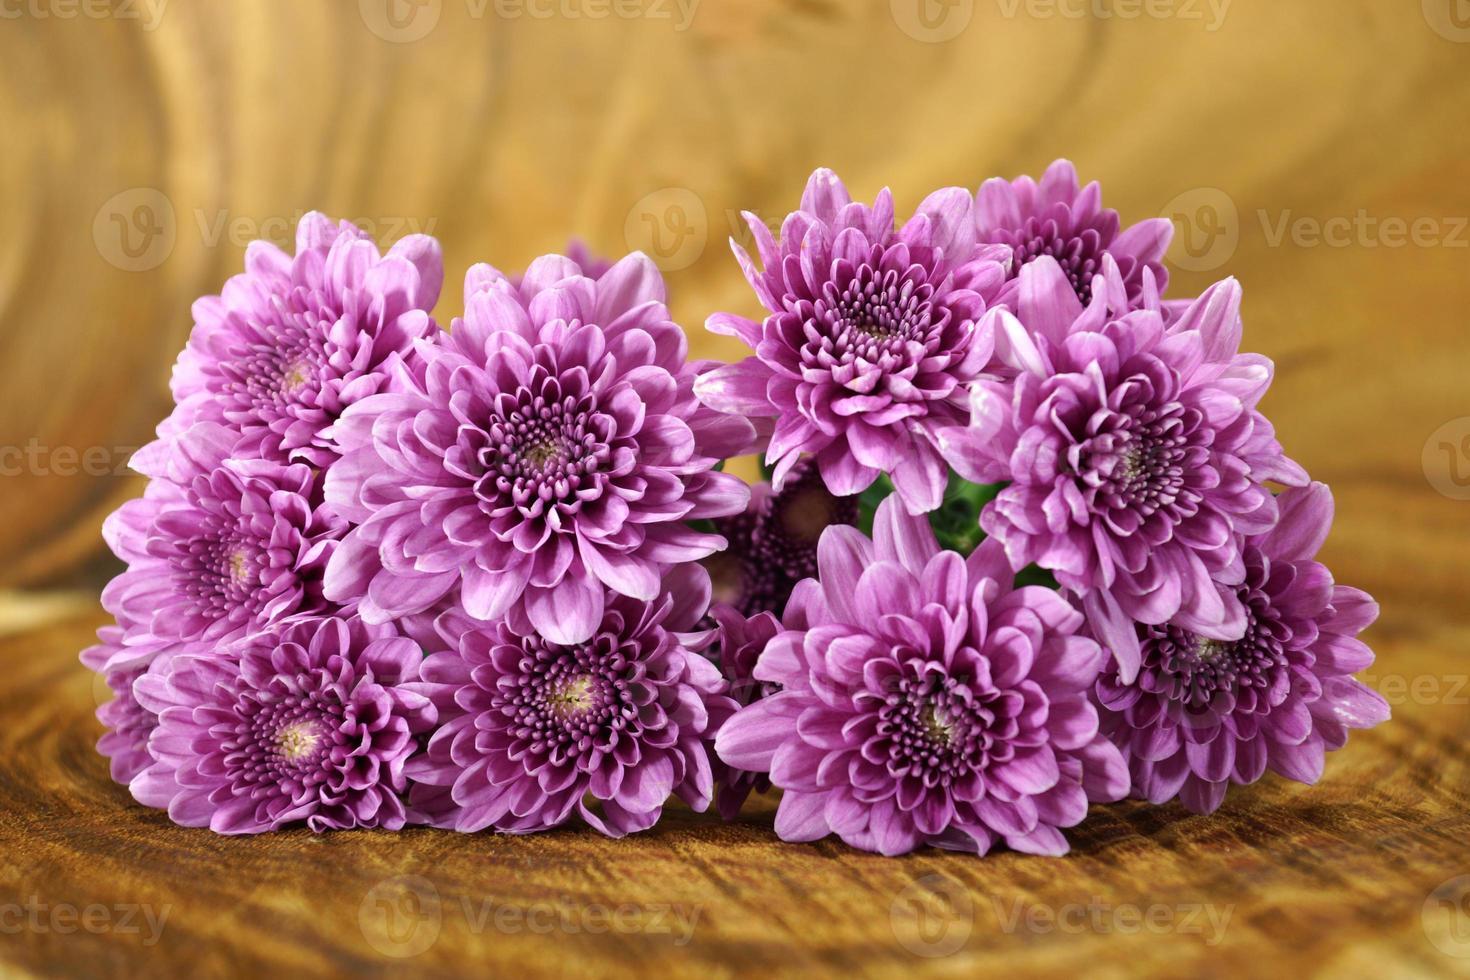 Violet chrysanthemum on wood background photo